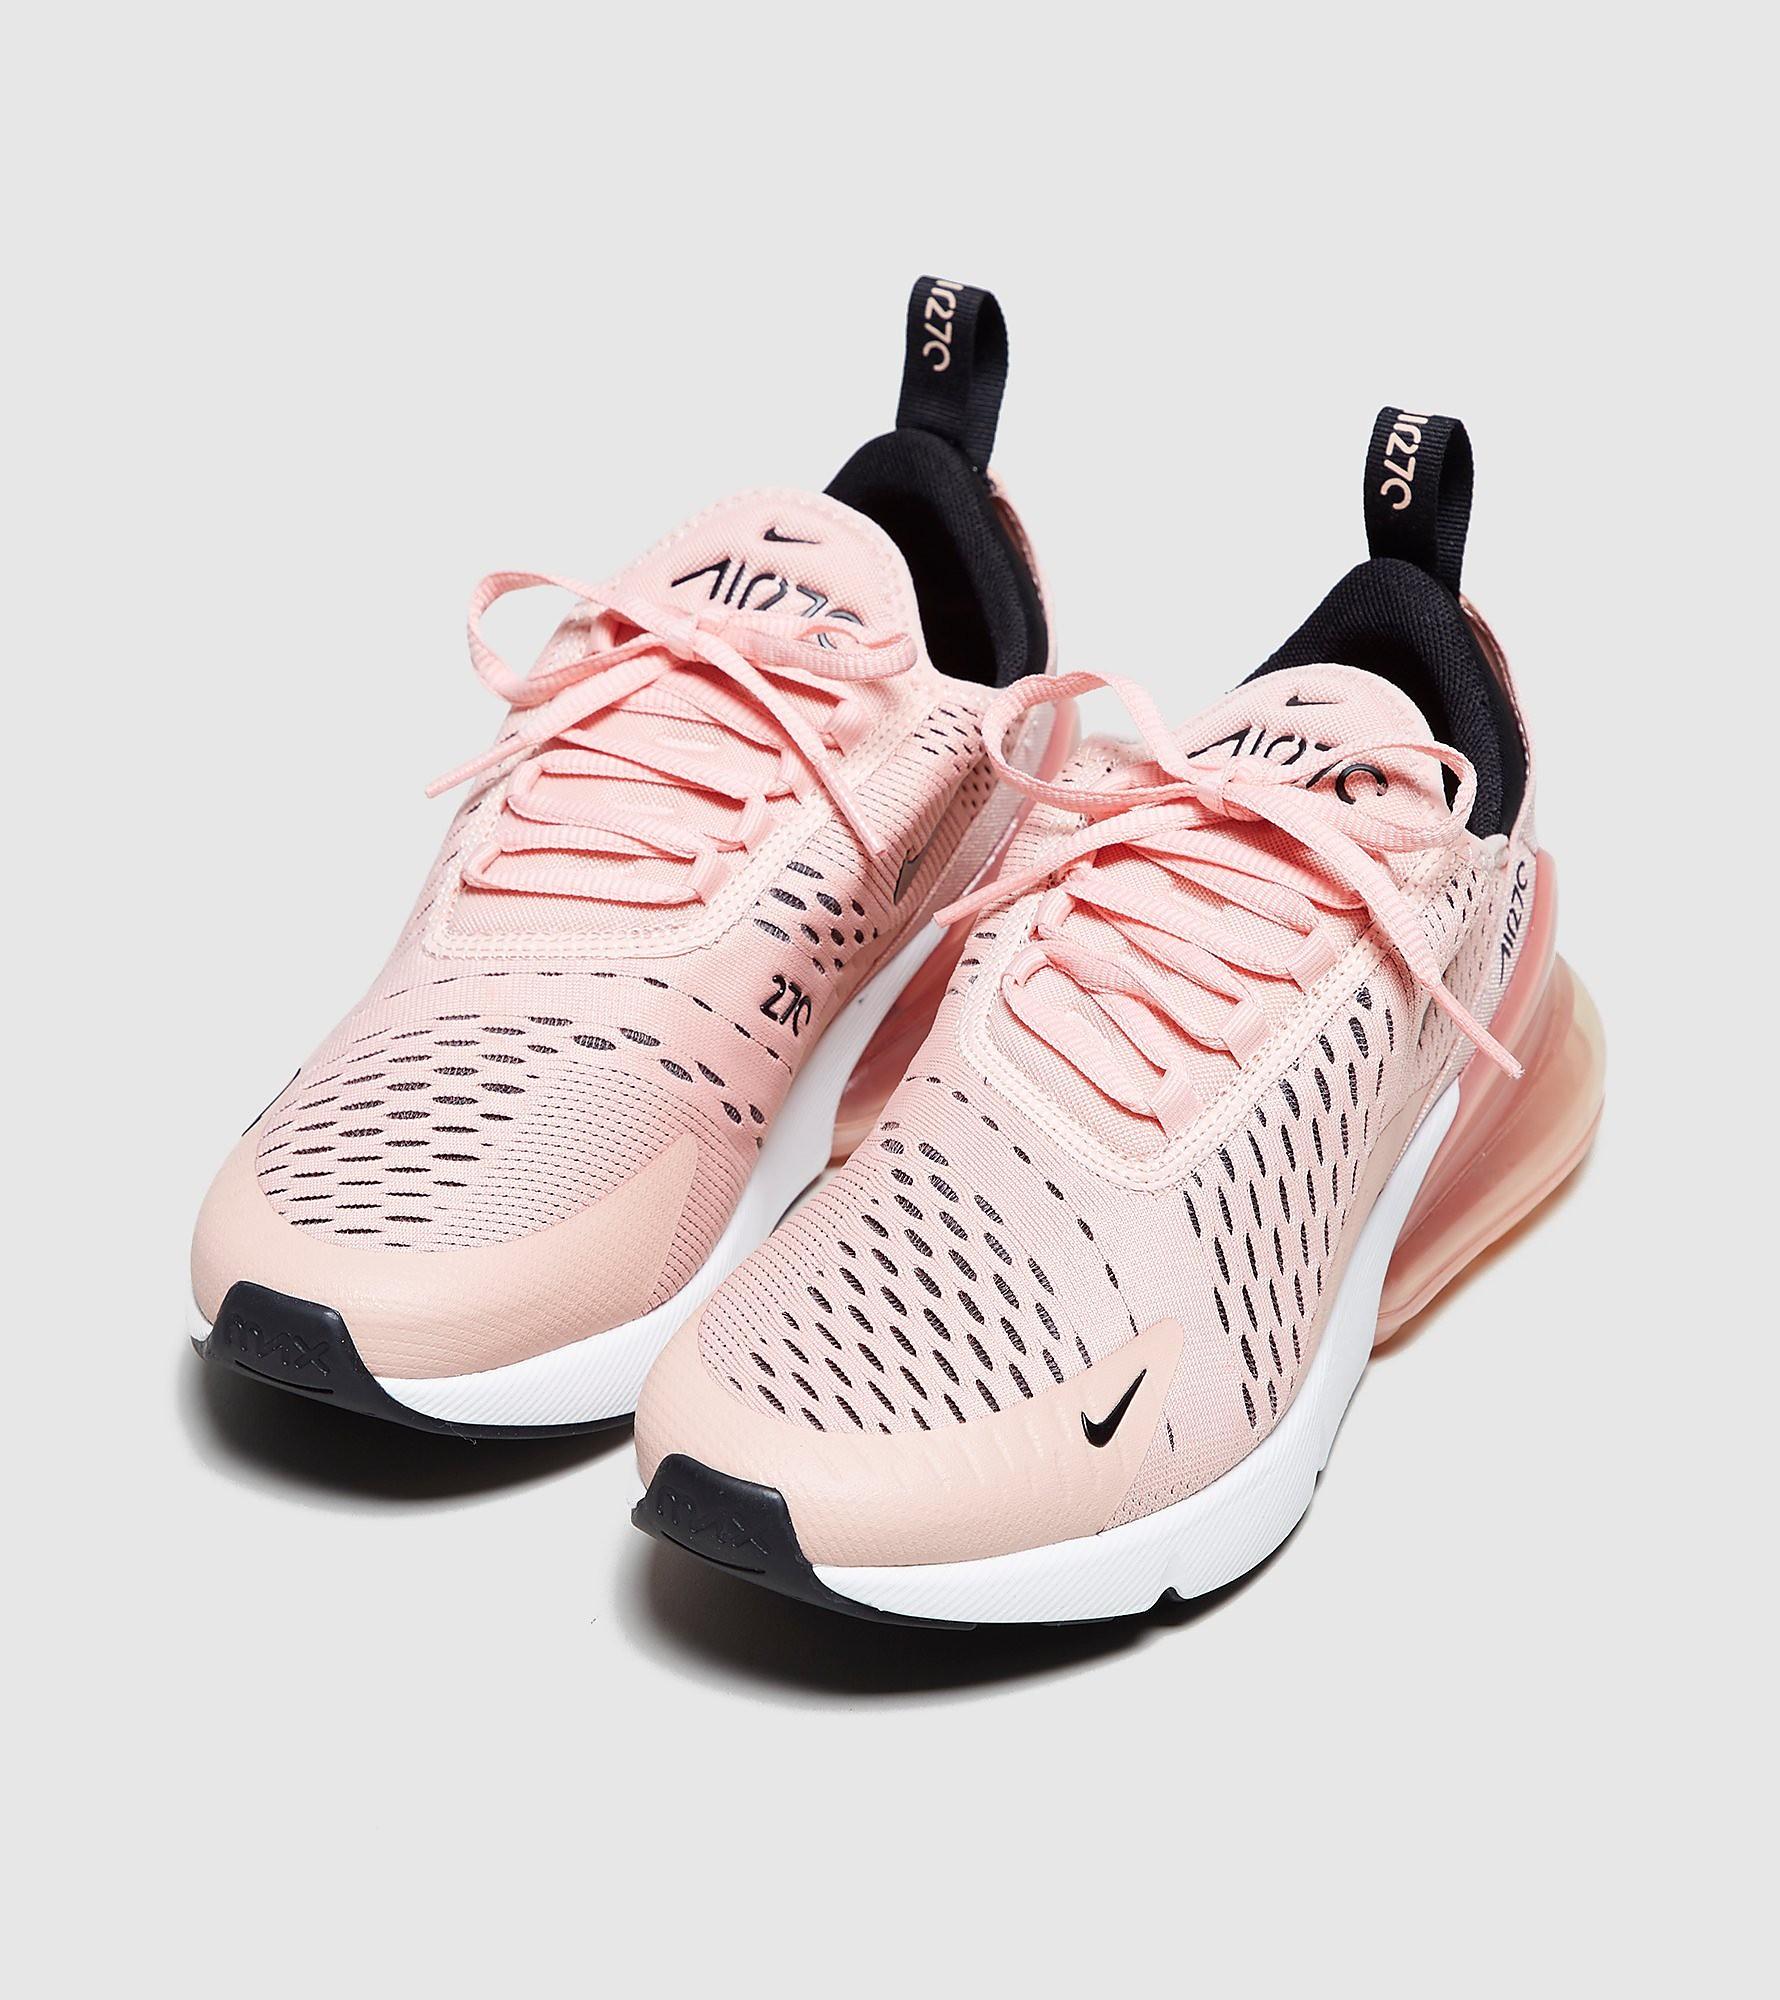 Nike Air Max 270 Women's